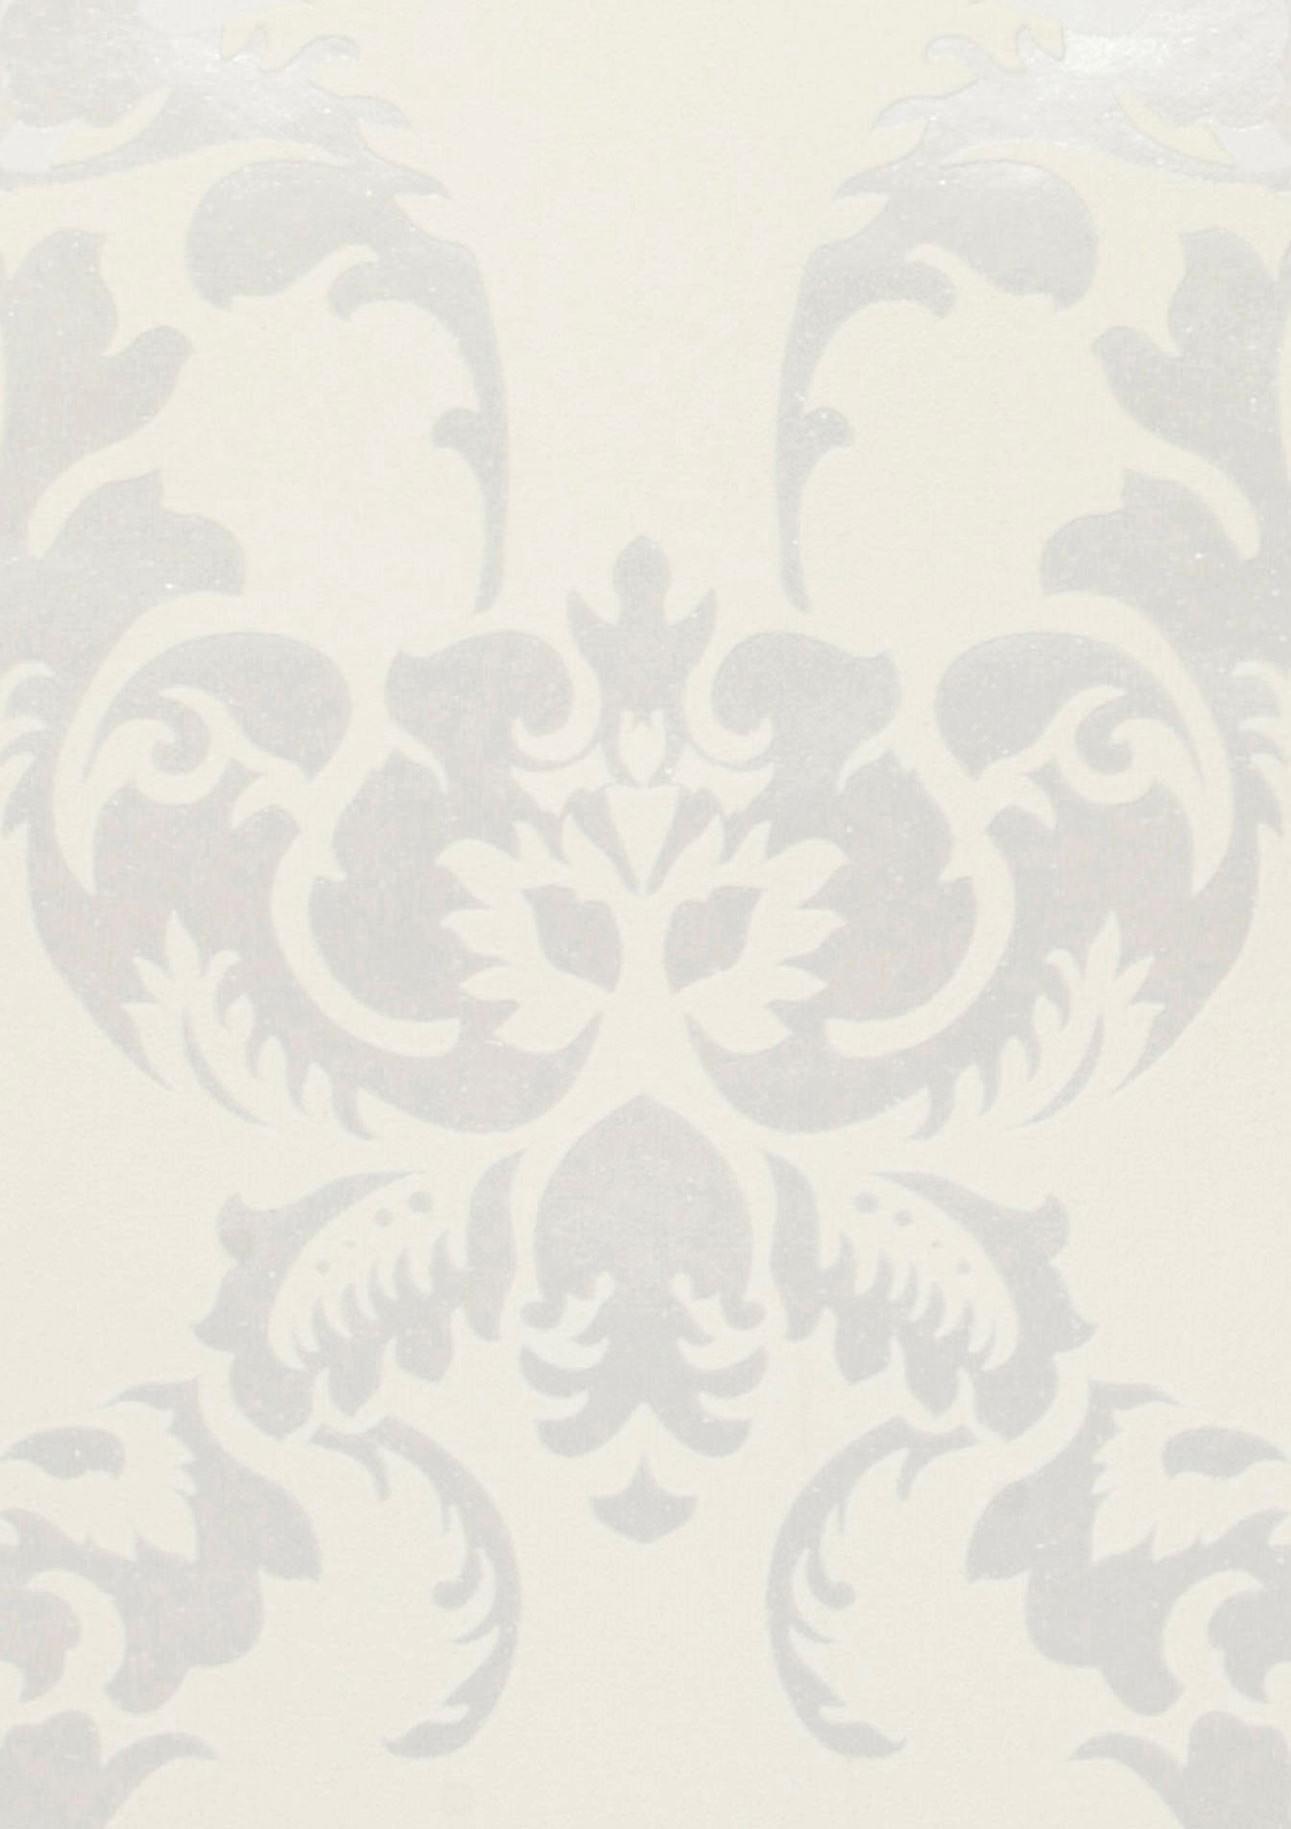 Carta da parati siemara bianco crema avorio chiaro for Carta parati argento